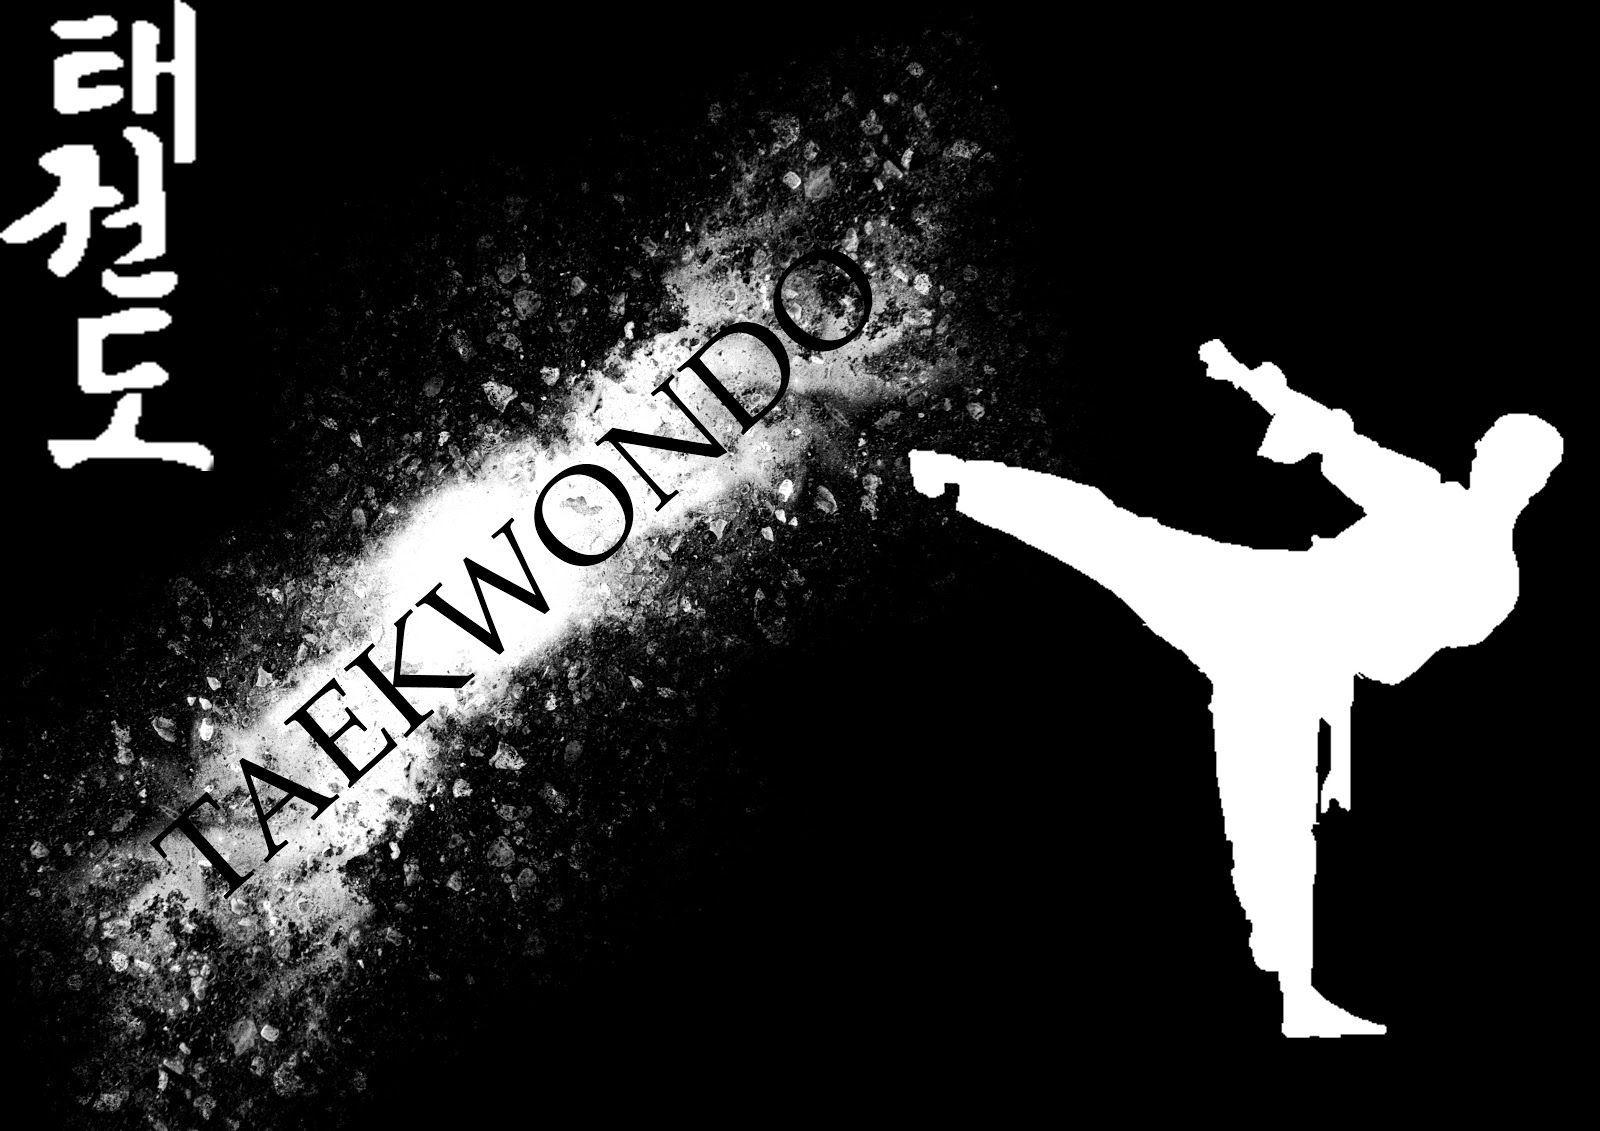 Taekwondo Fighter Wallpapers   Top Taekwondo Fighter 1600x1131